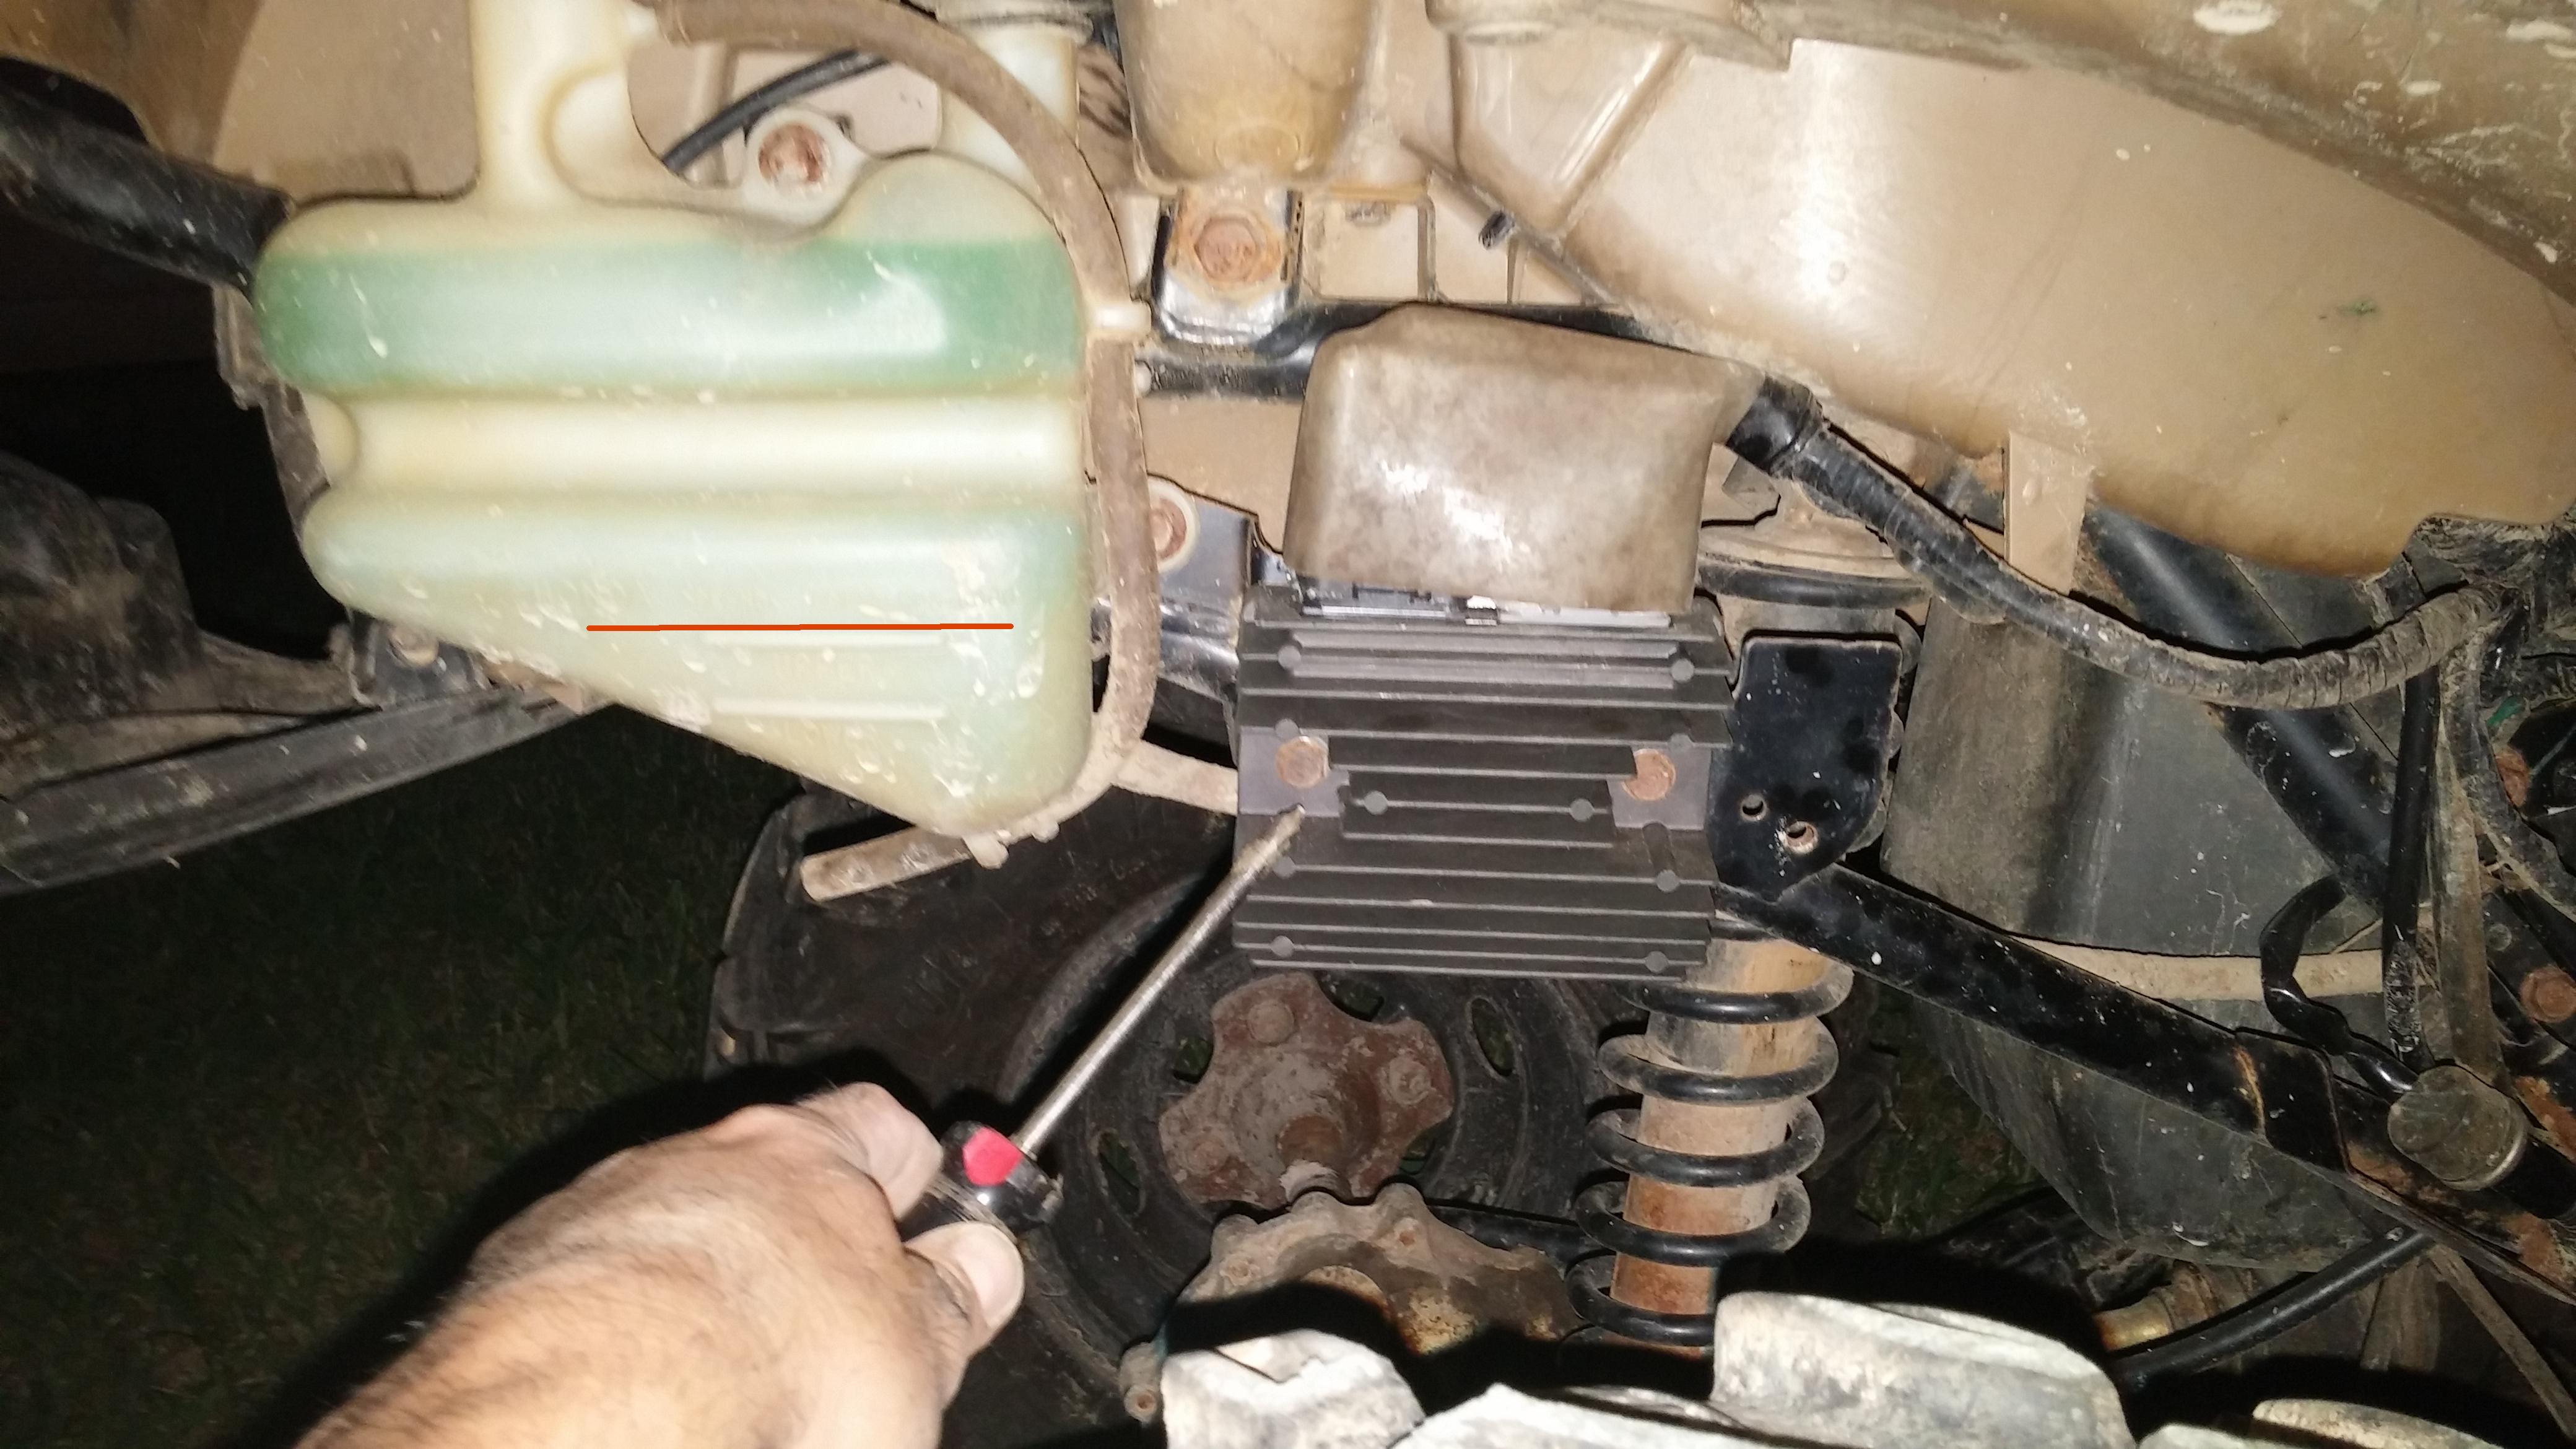 2008 Rancher 420fm Electric Issue With Pics Honda Atv Forum